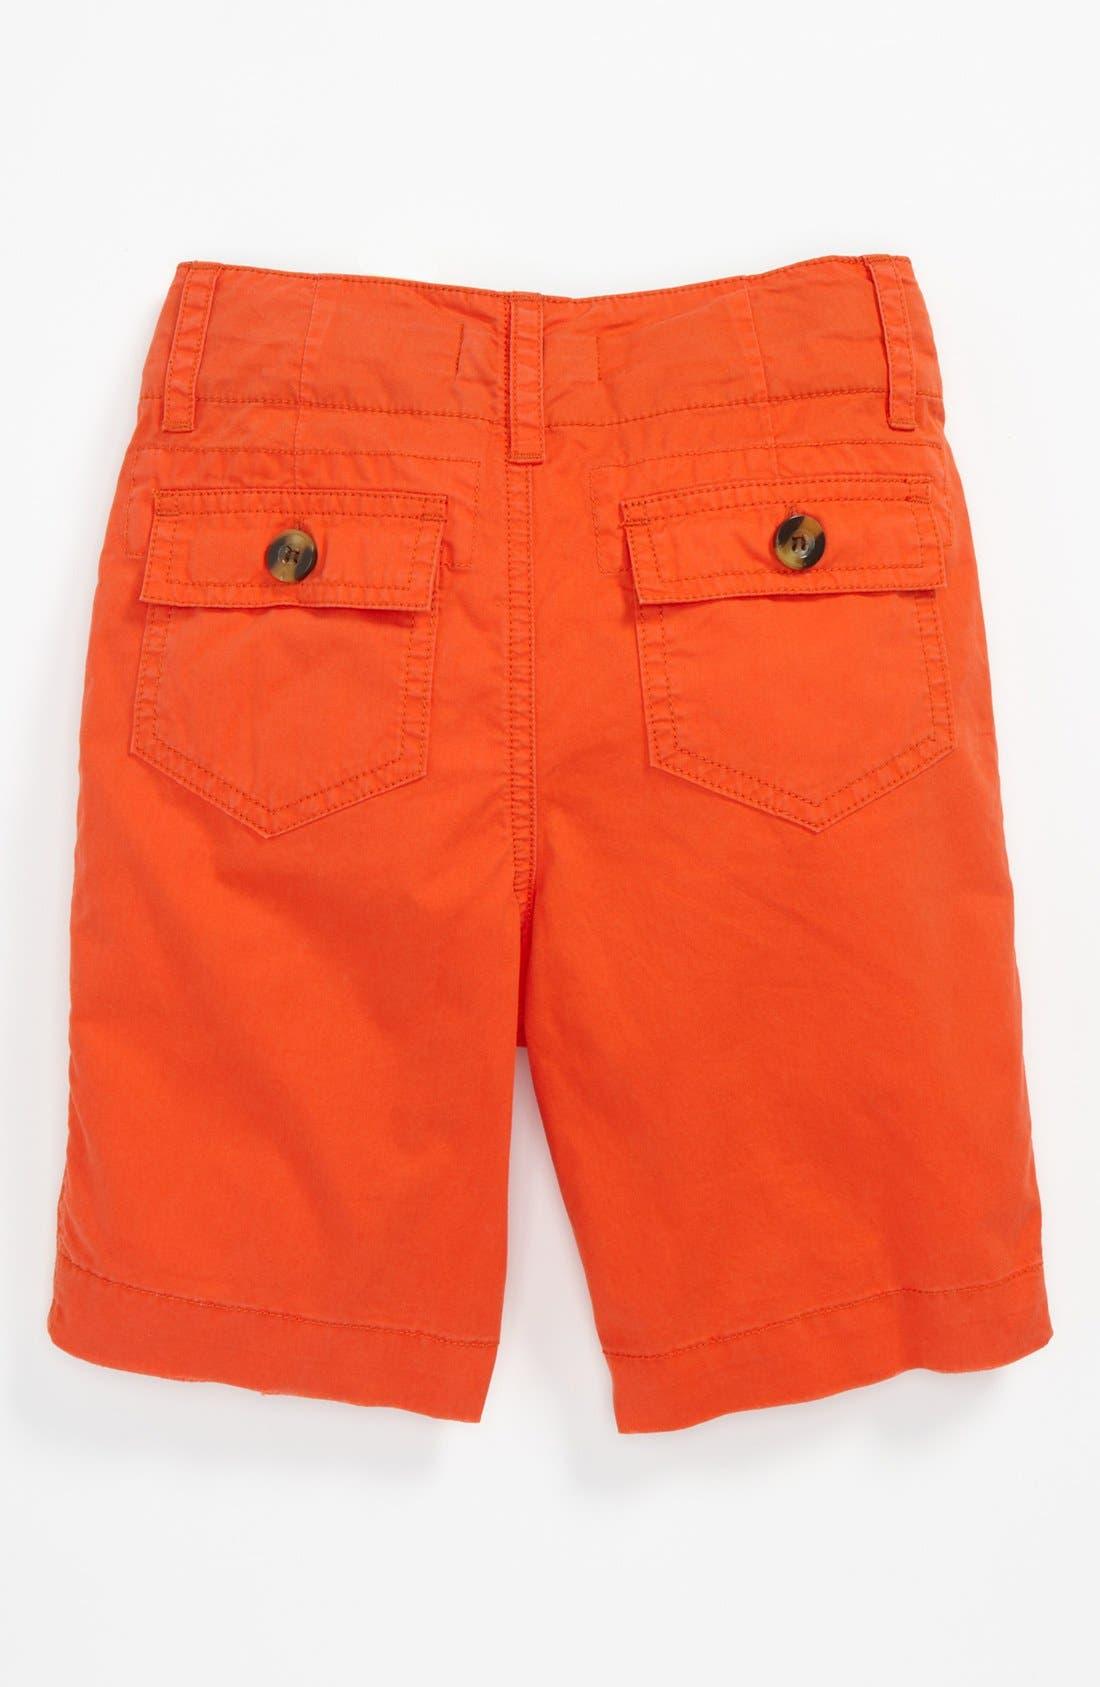 Alternate Image 2  - Peek 'Jericho' Utility Shorts (Toddler Boys, Little Boys & Big Boys)